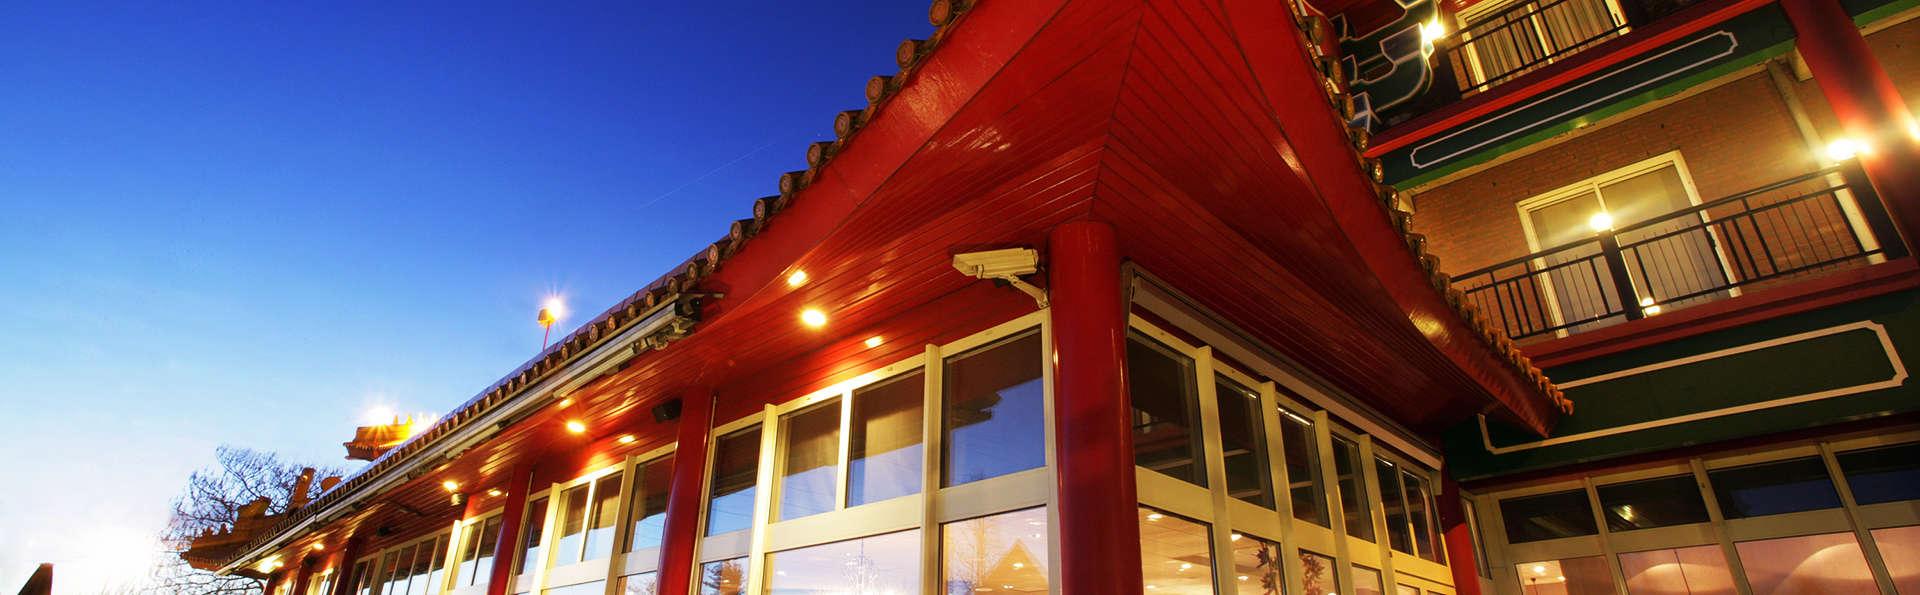 Van der Valk Hotel Breukelen - EDIT_exteriorestaurant.jpg